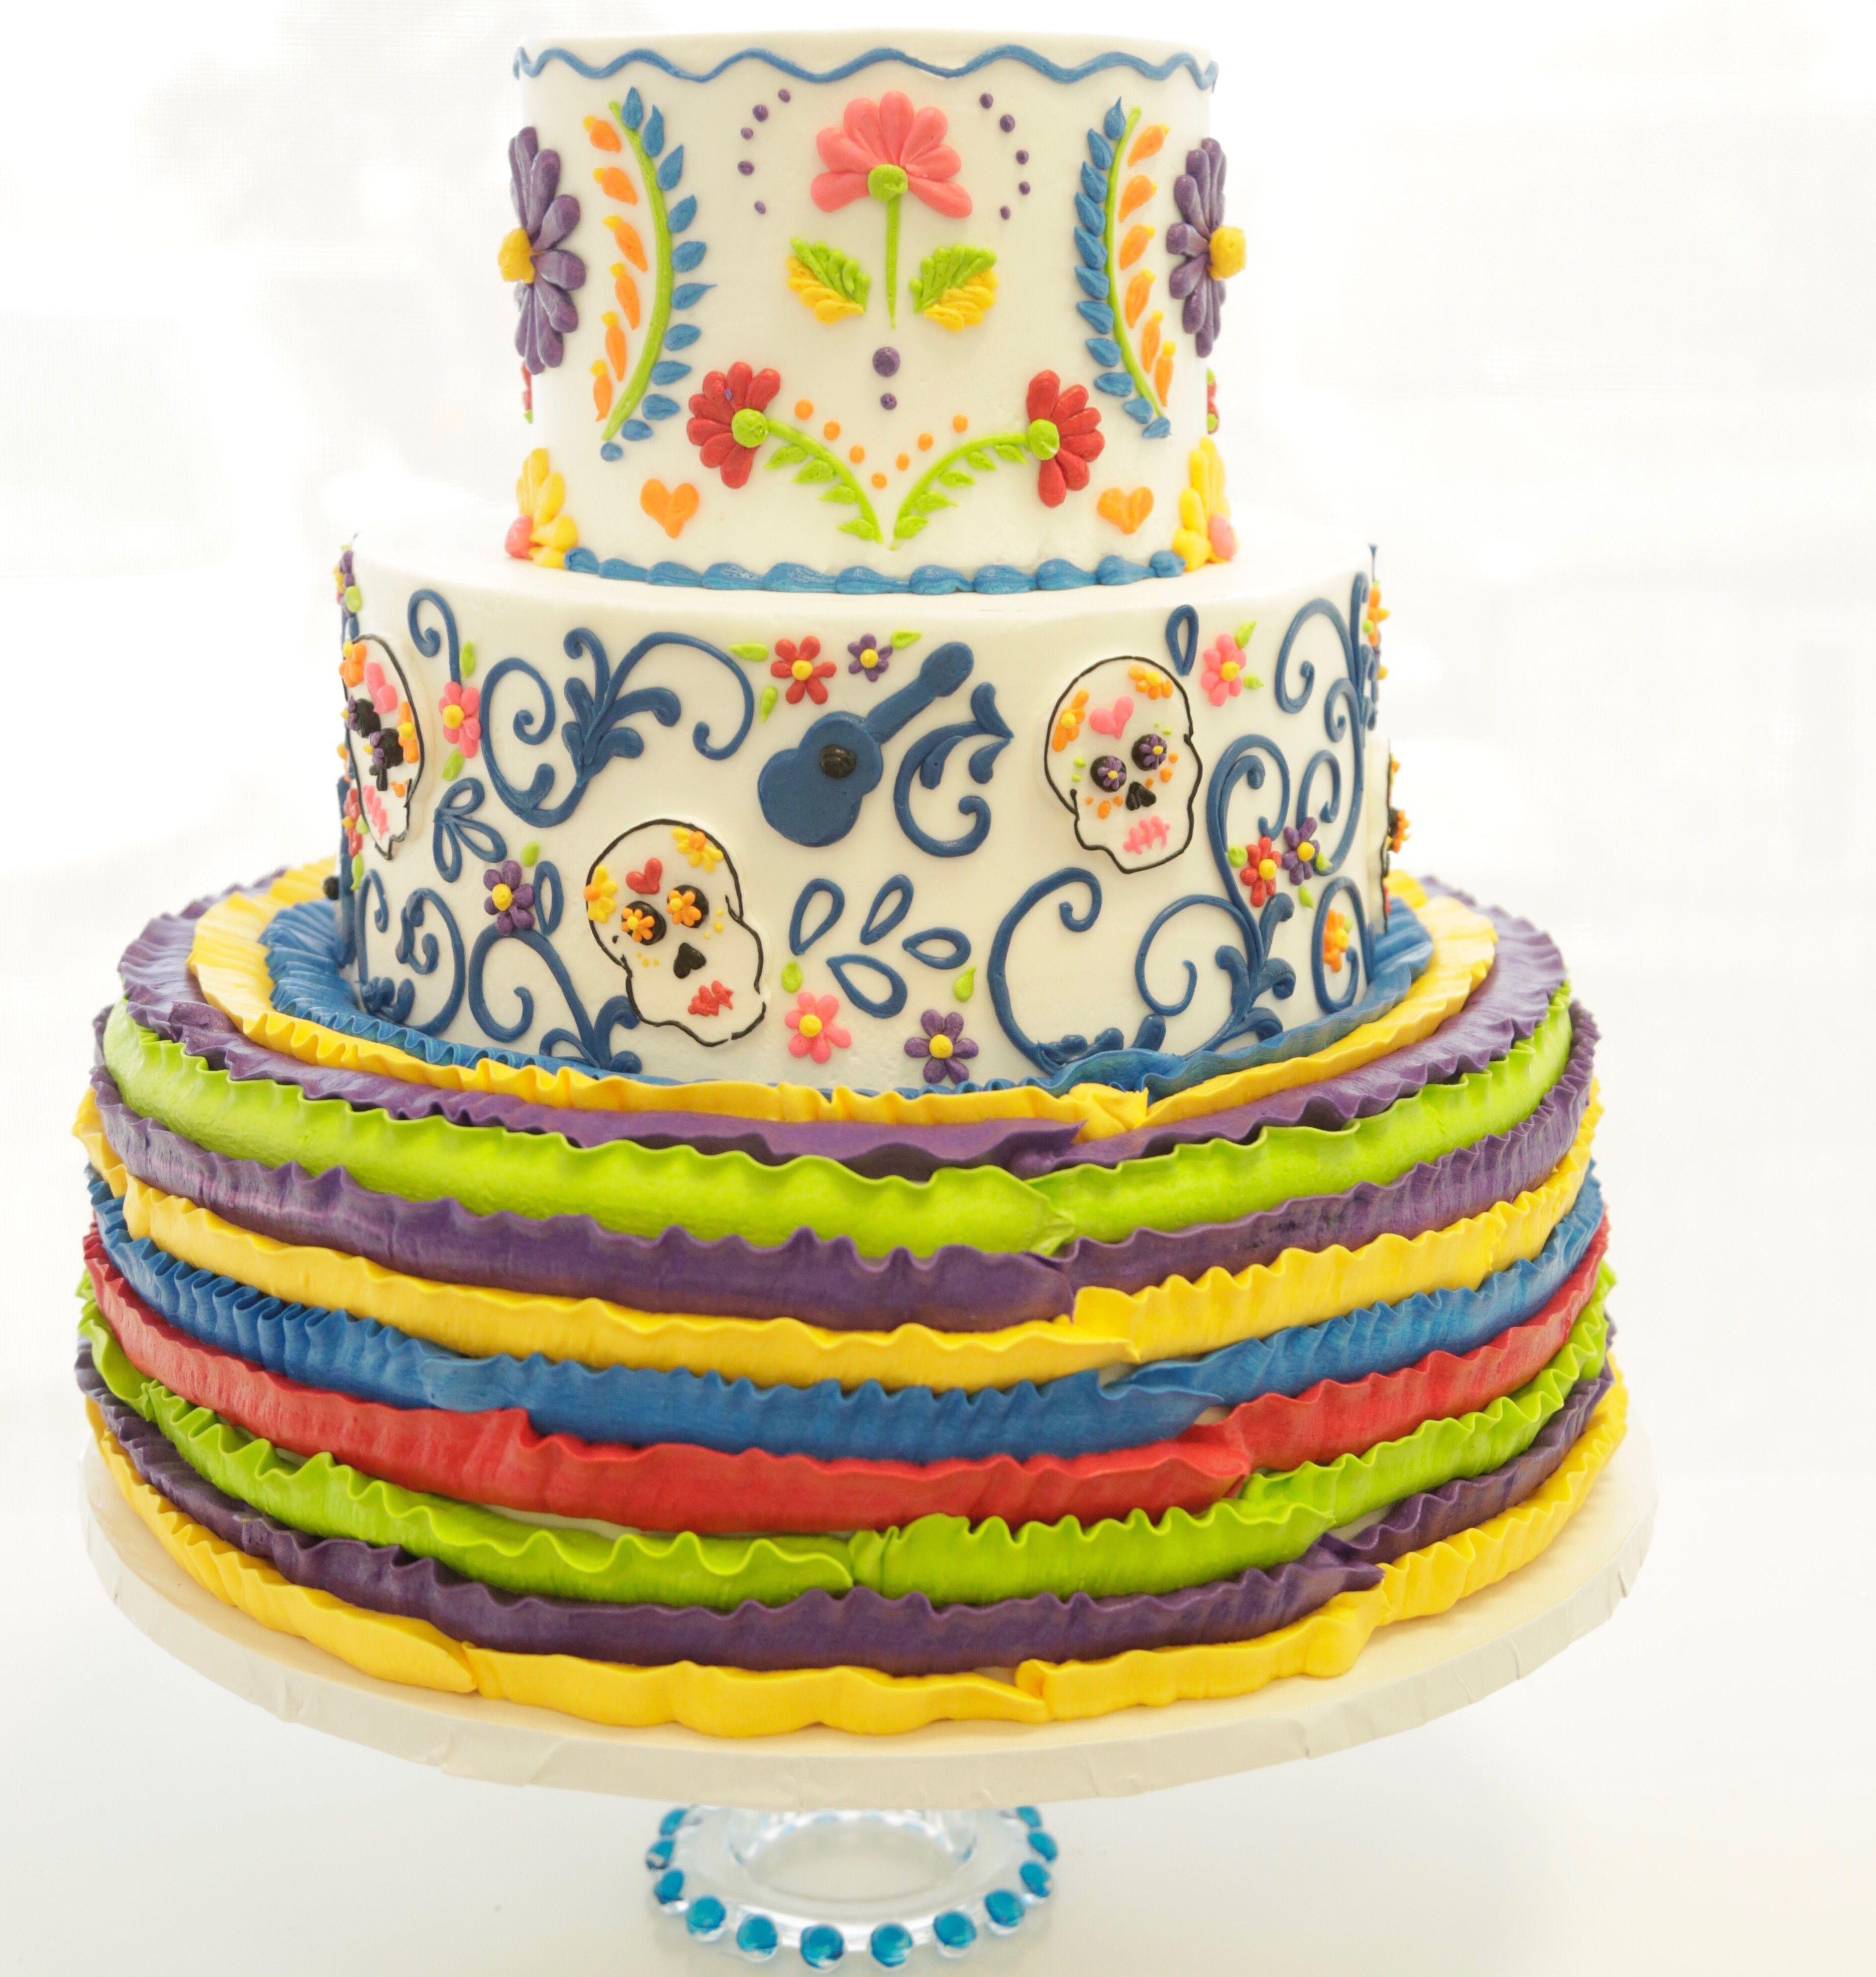 Buttercream Fiesta Cake From Great Dane Baking Company Cake